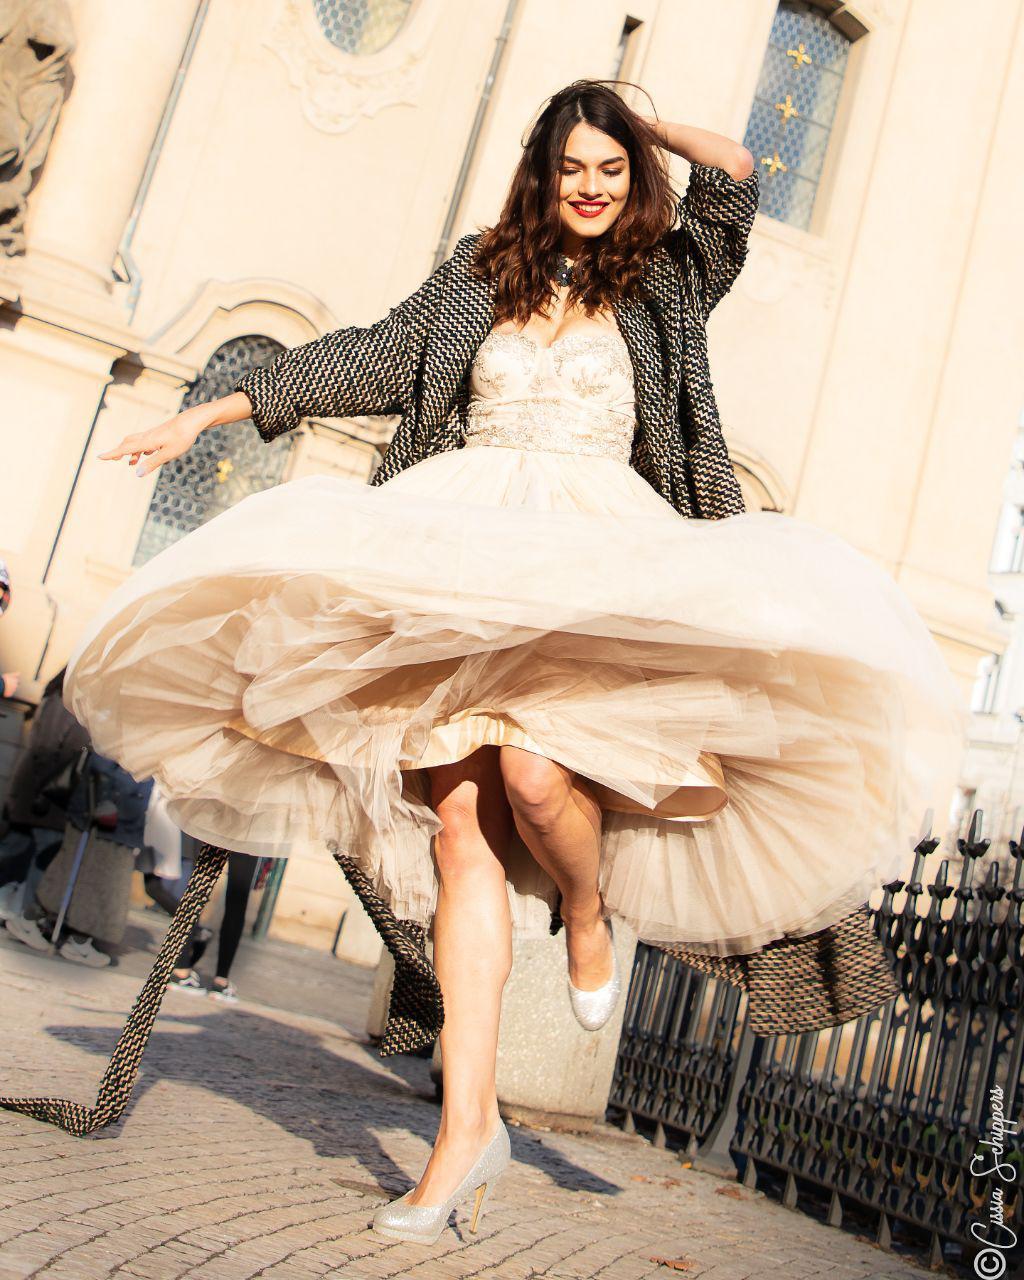 Красавица из Узбекистана рассказала, как её обманули на конкурсе красоты